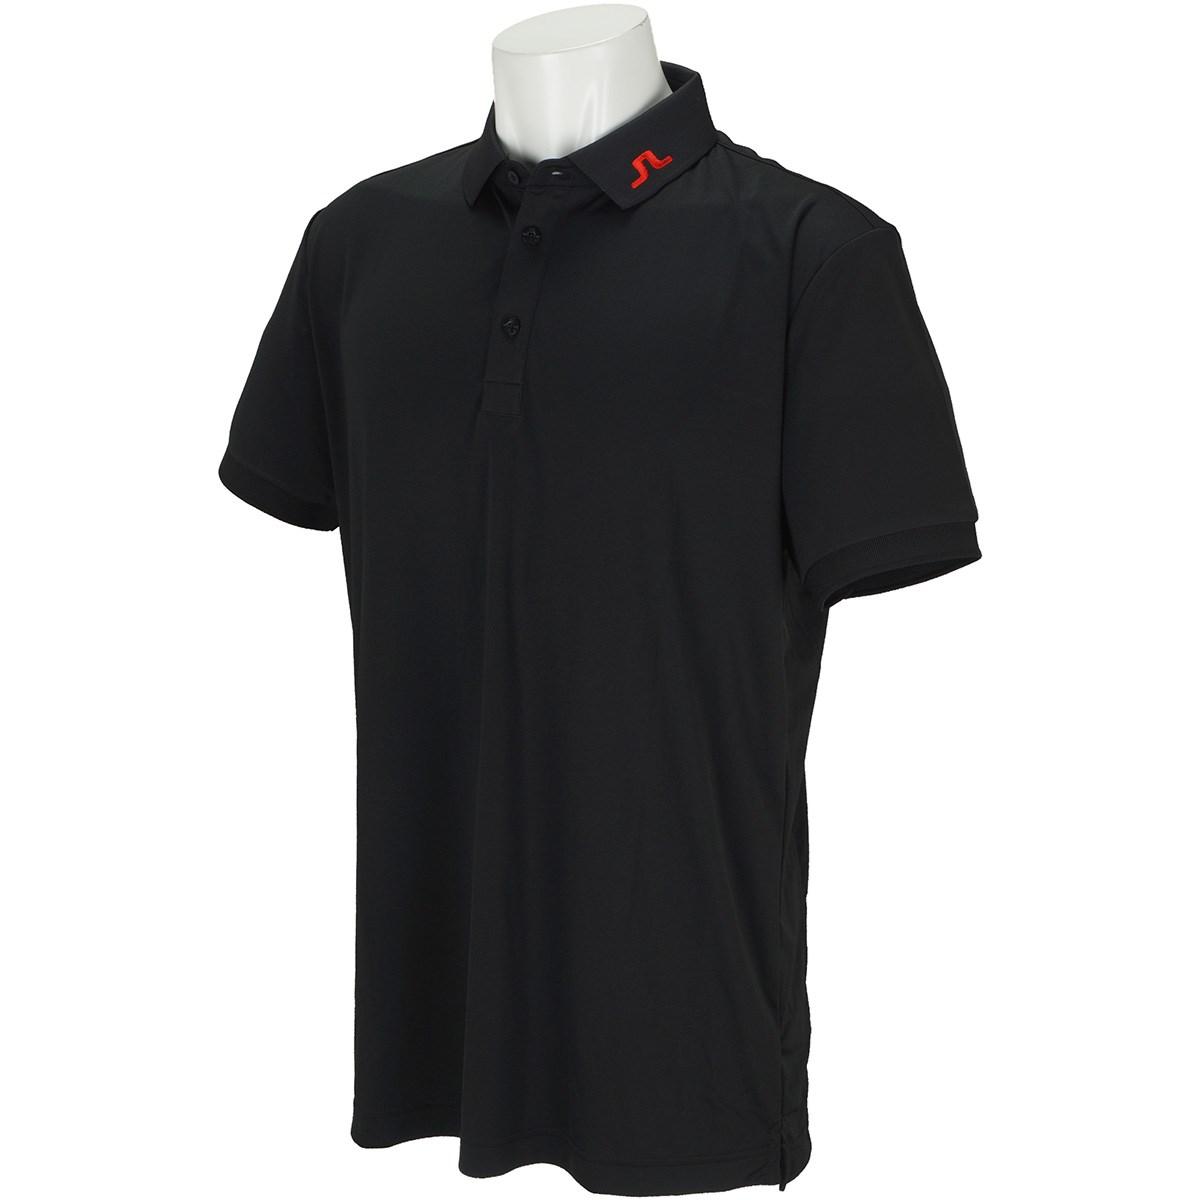 J.リンドバーグ Regular Fit 半袖ポロシャツ